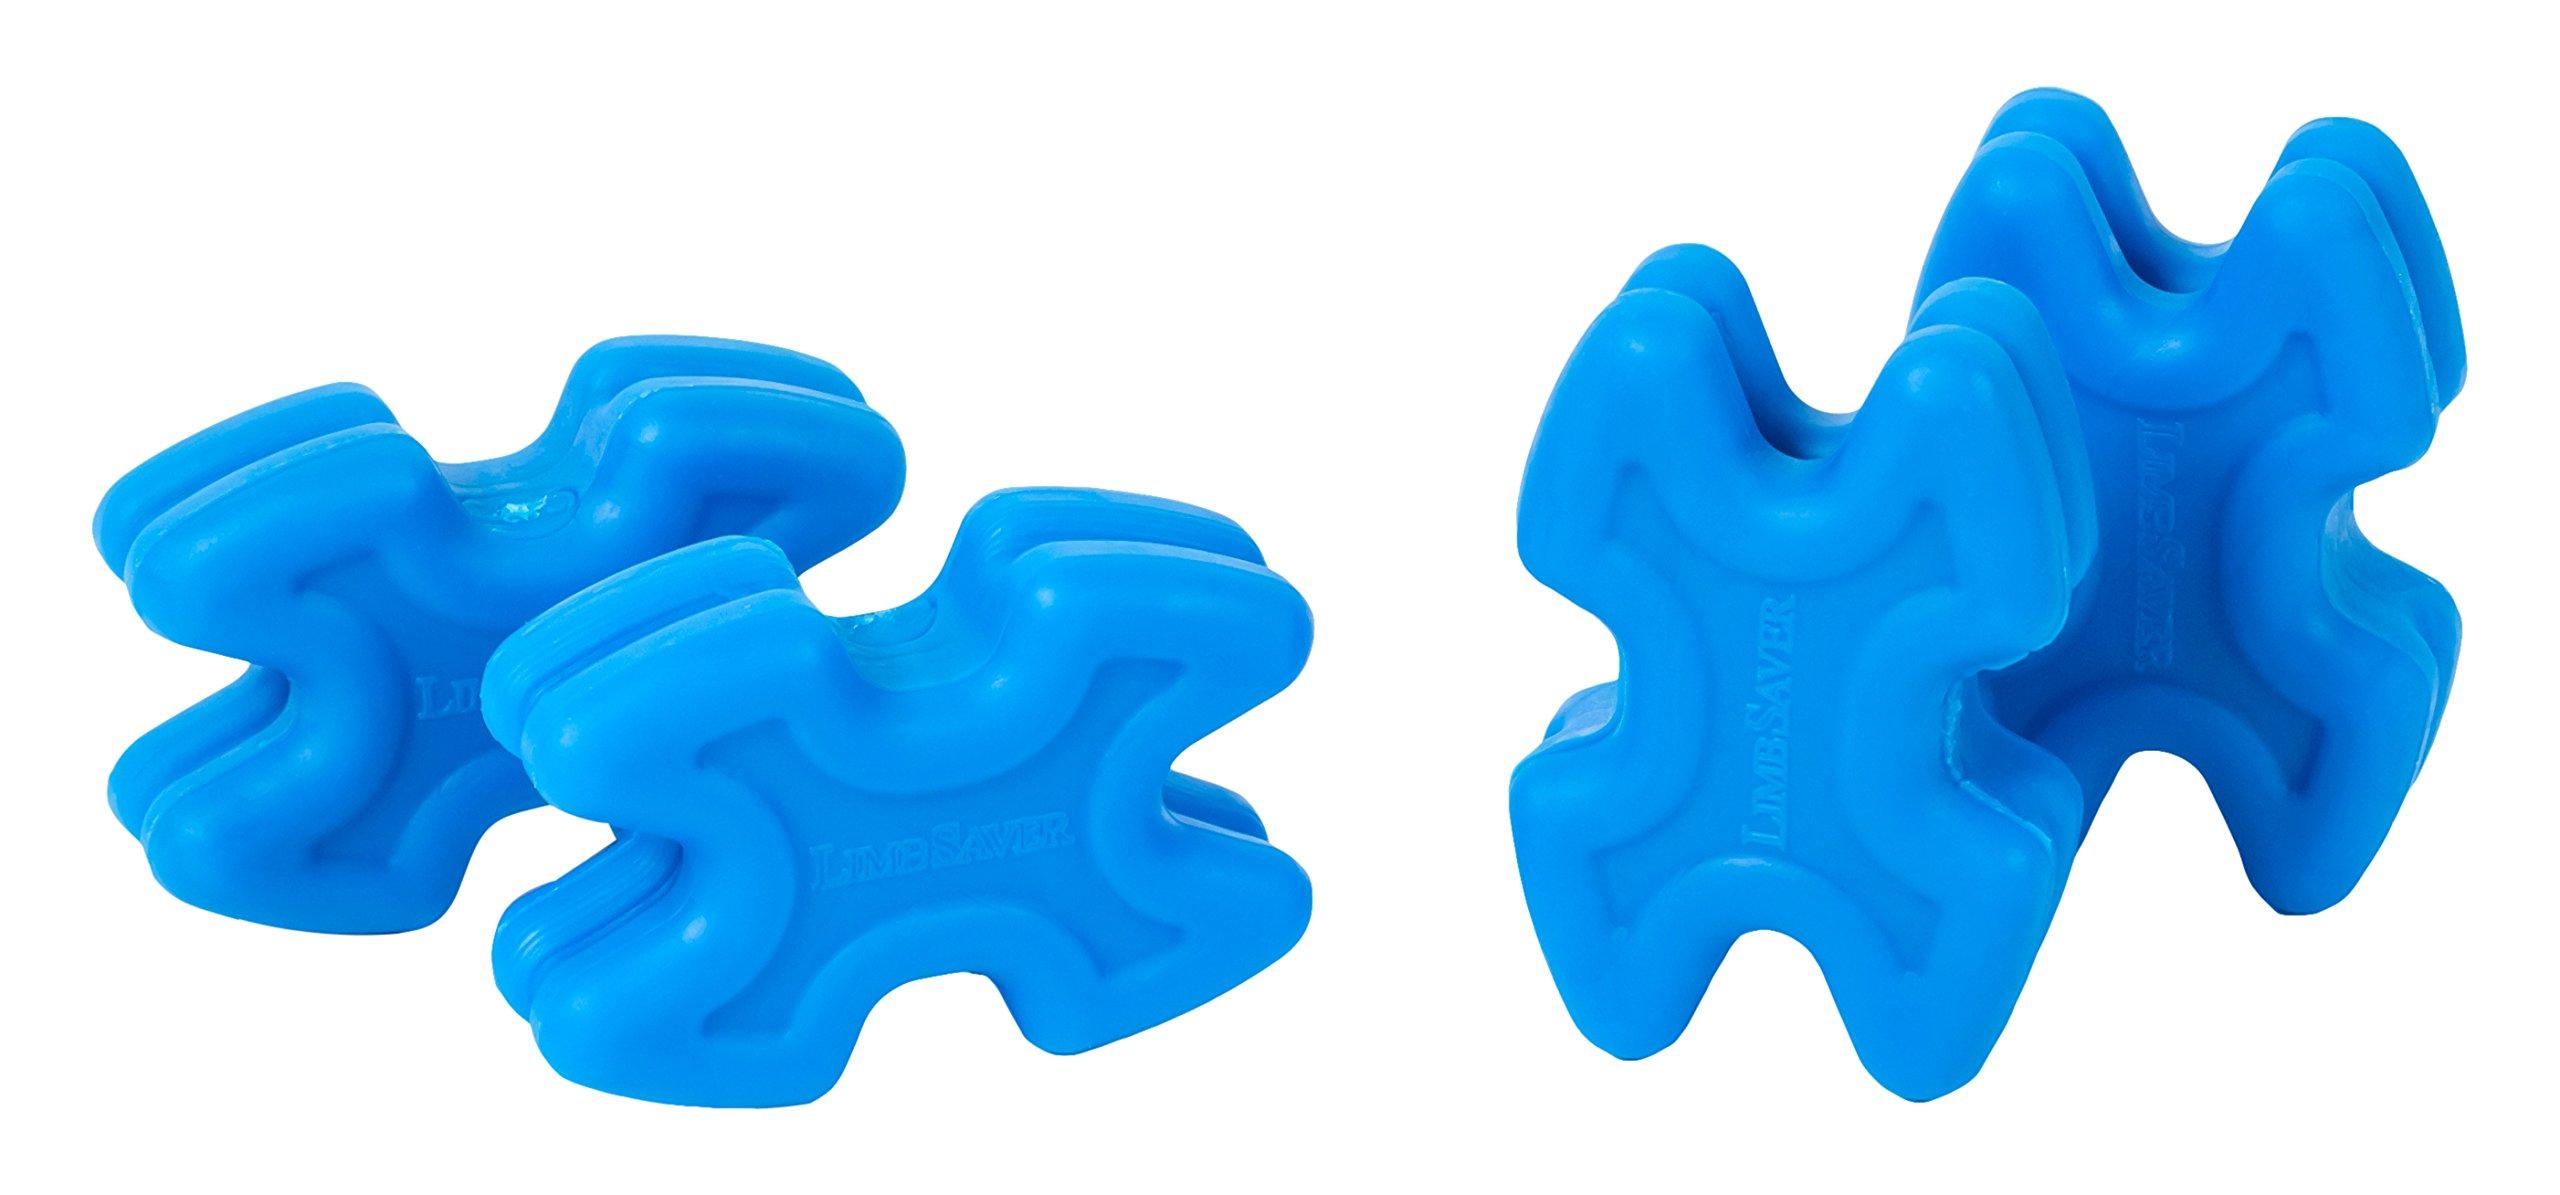 LimbSaver 4722 TwistLox Dampener for Split Limb Bows, Blue